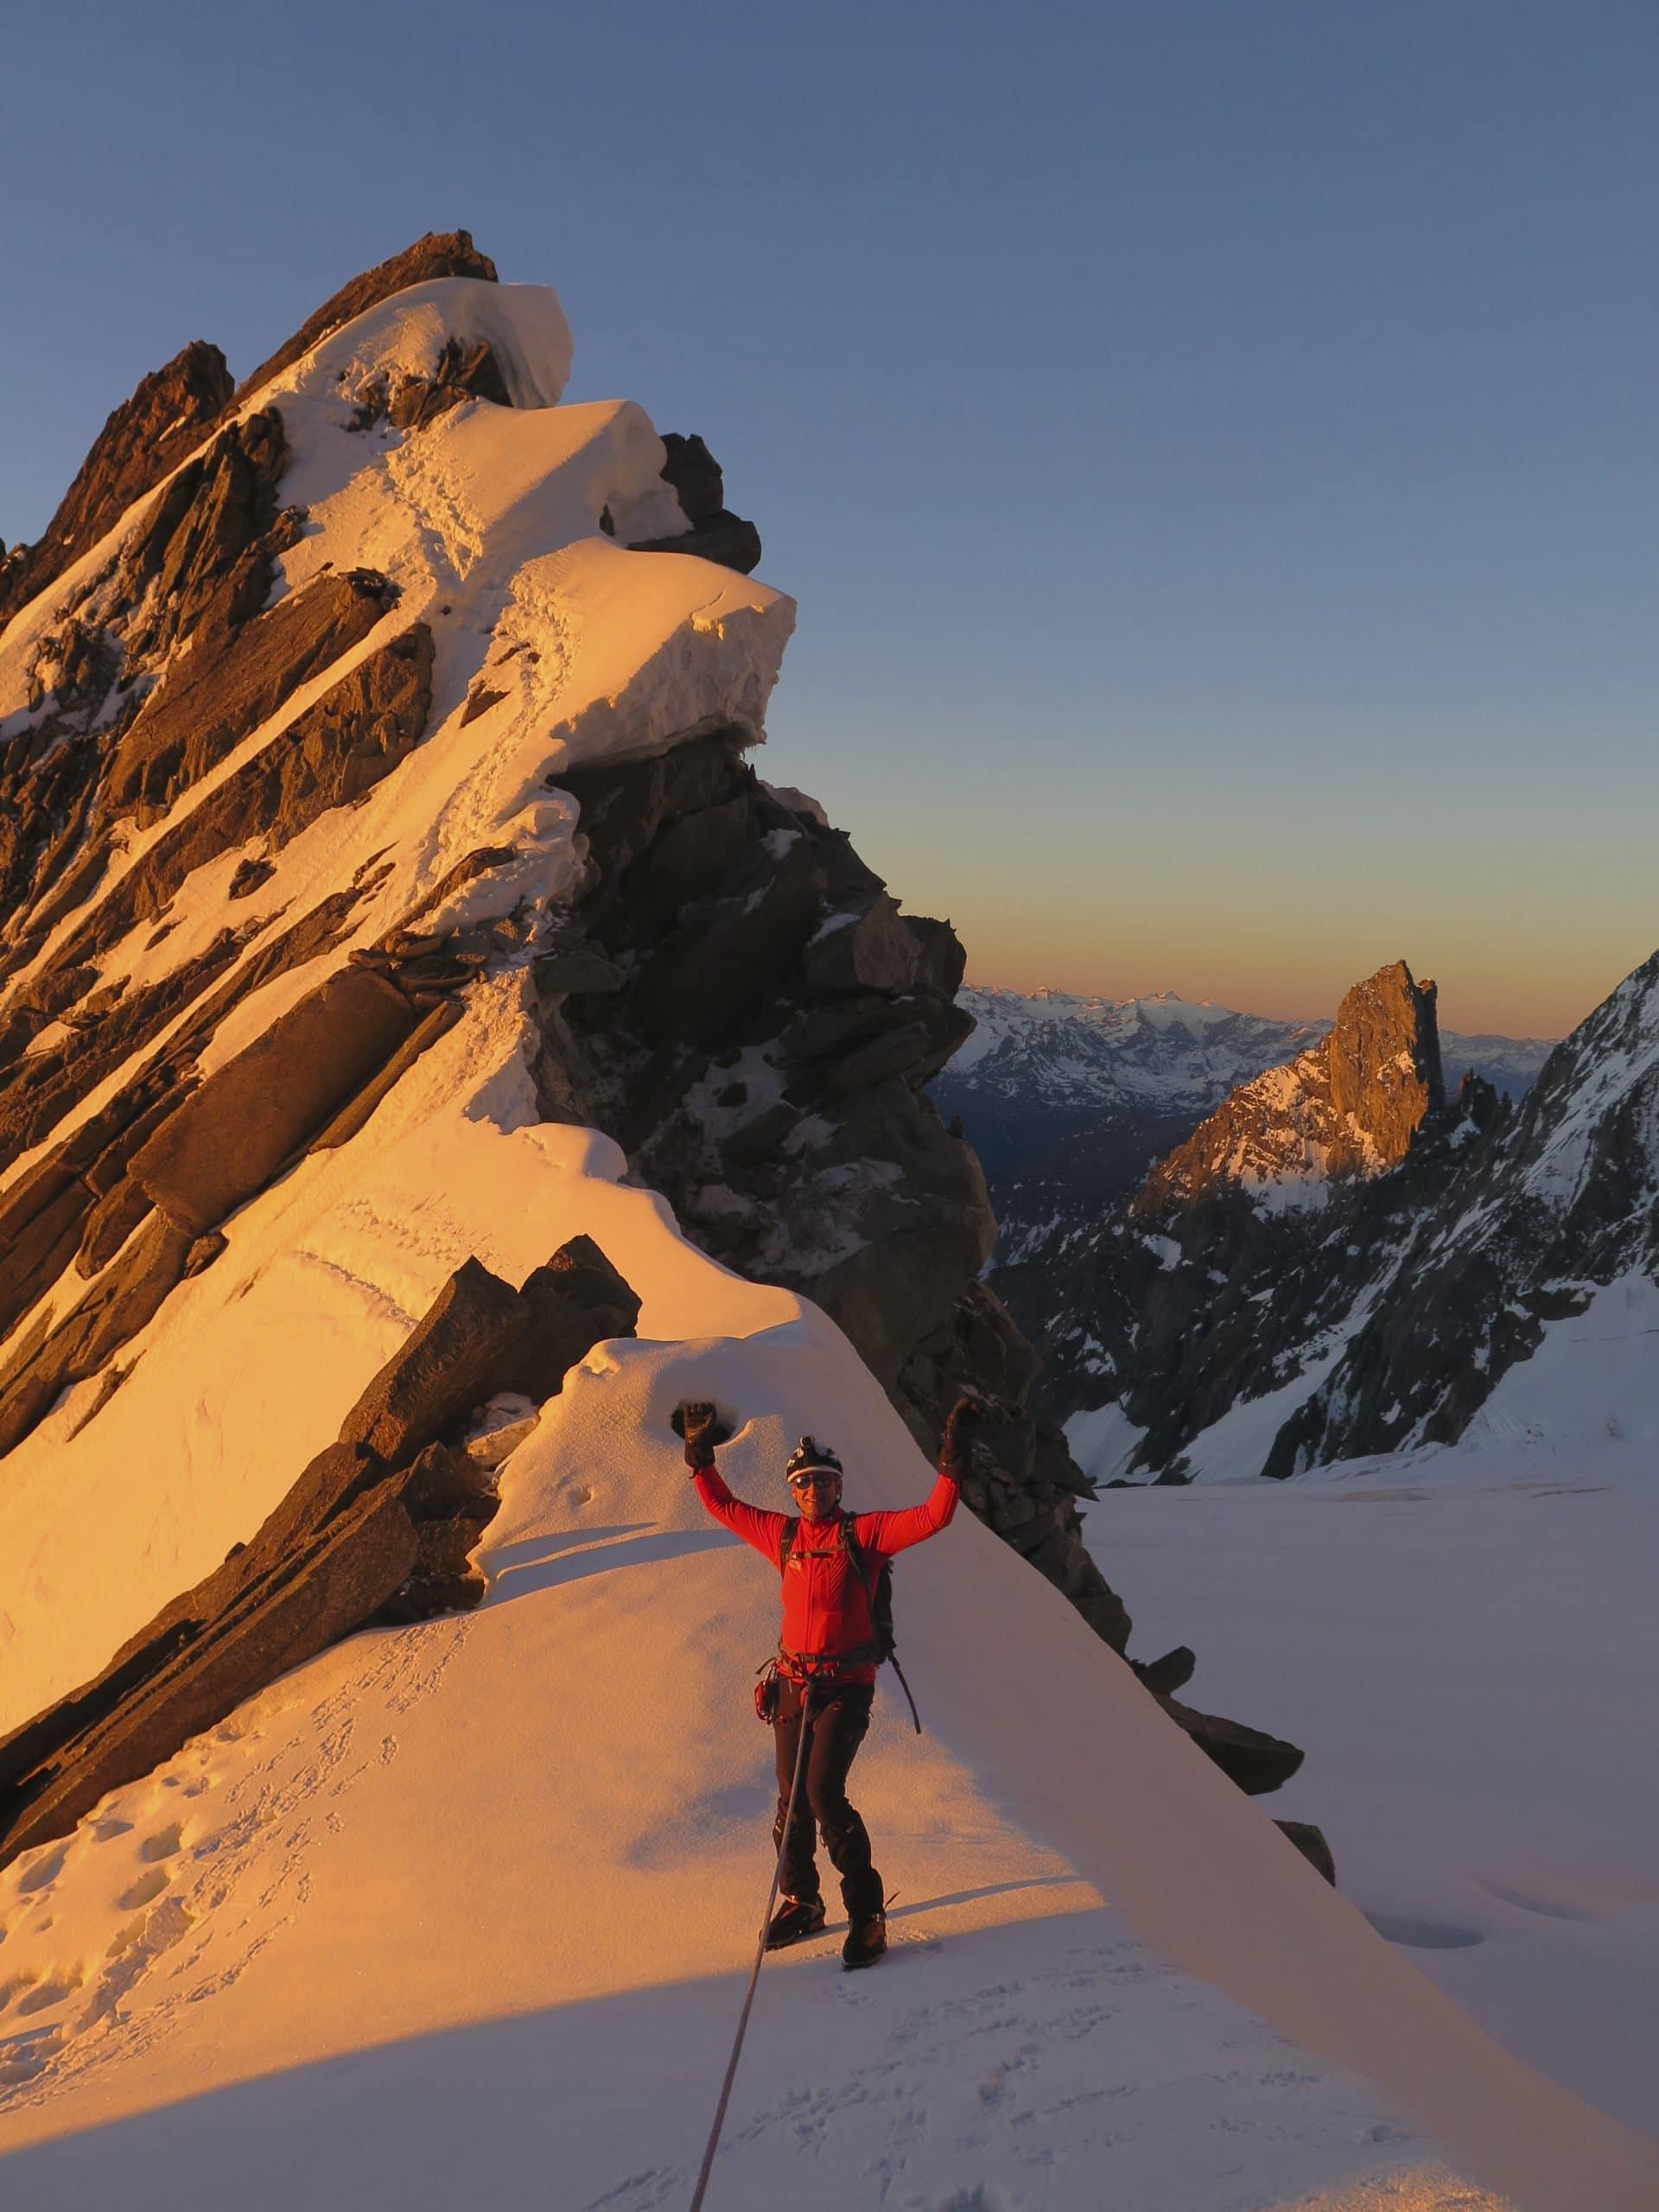 Helyum_Xavier-Carrard_guide-de-montagne_Alpinisme_arete-Kufner_Mont-Maudit_France_3